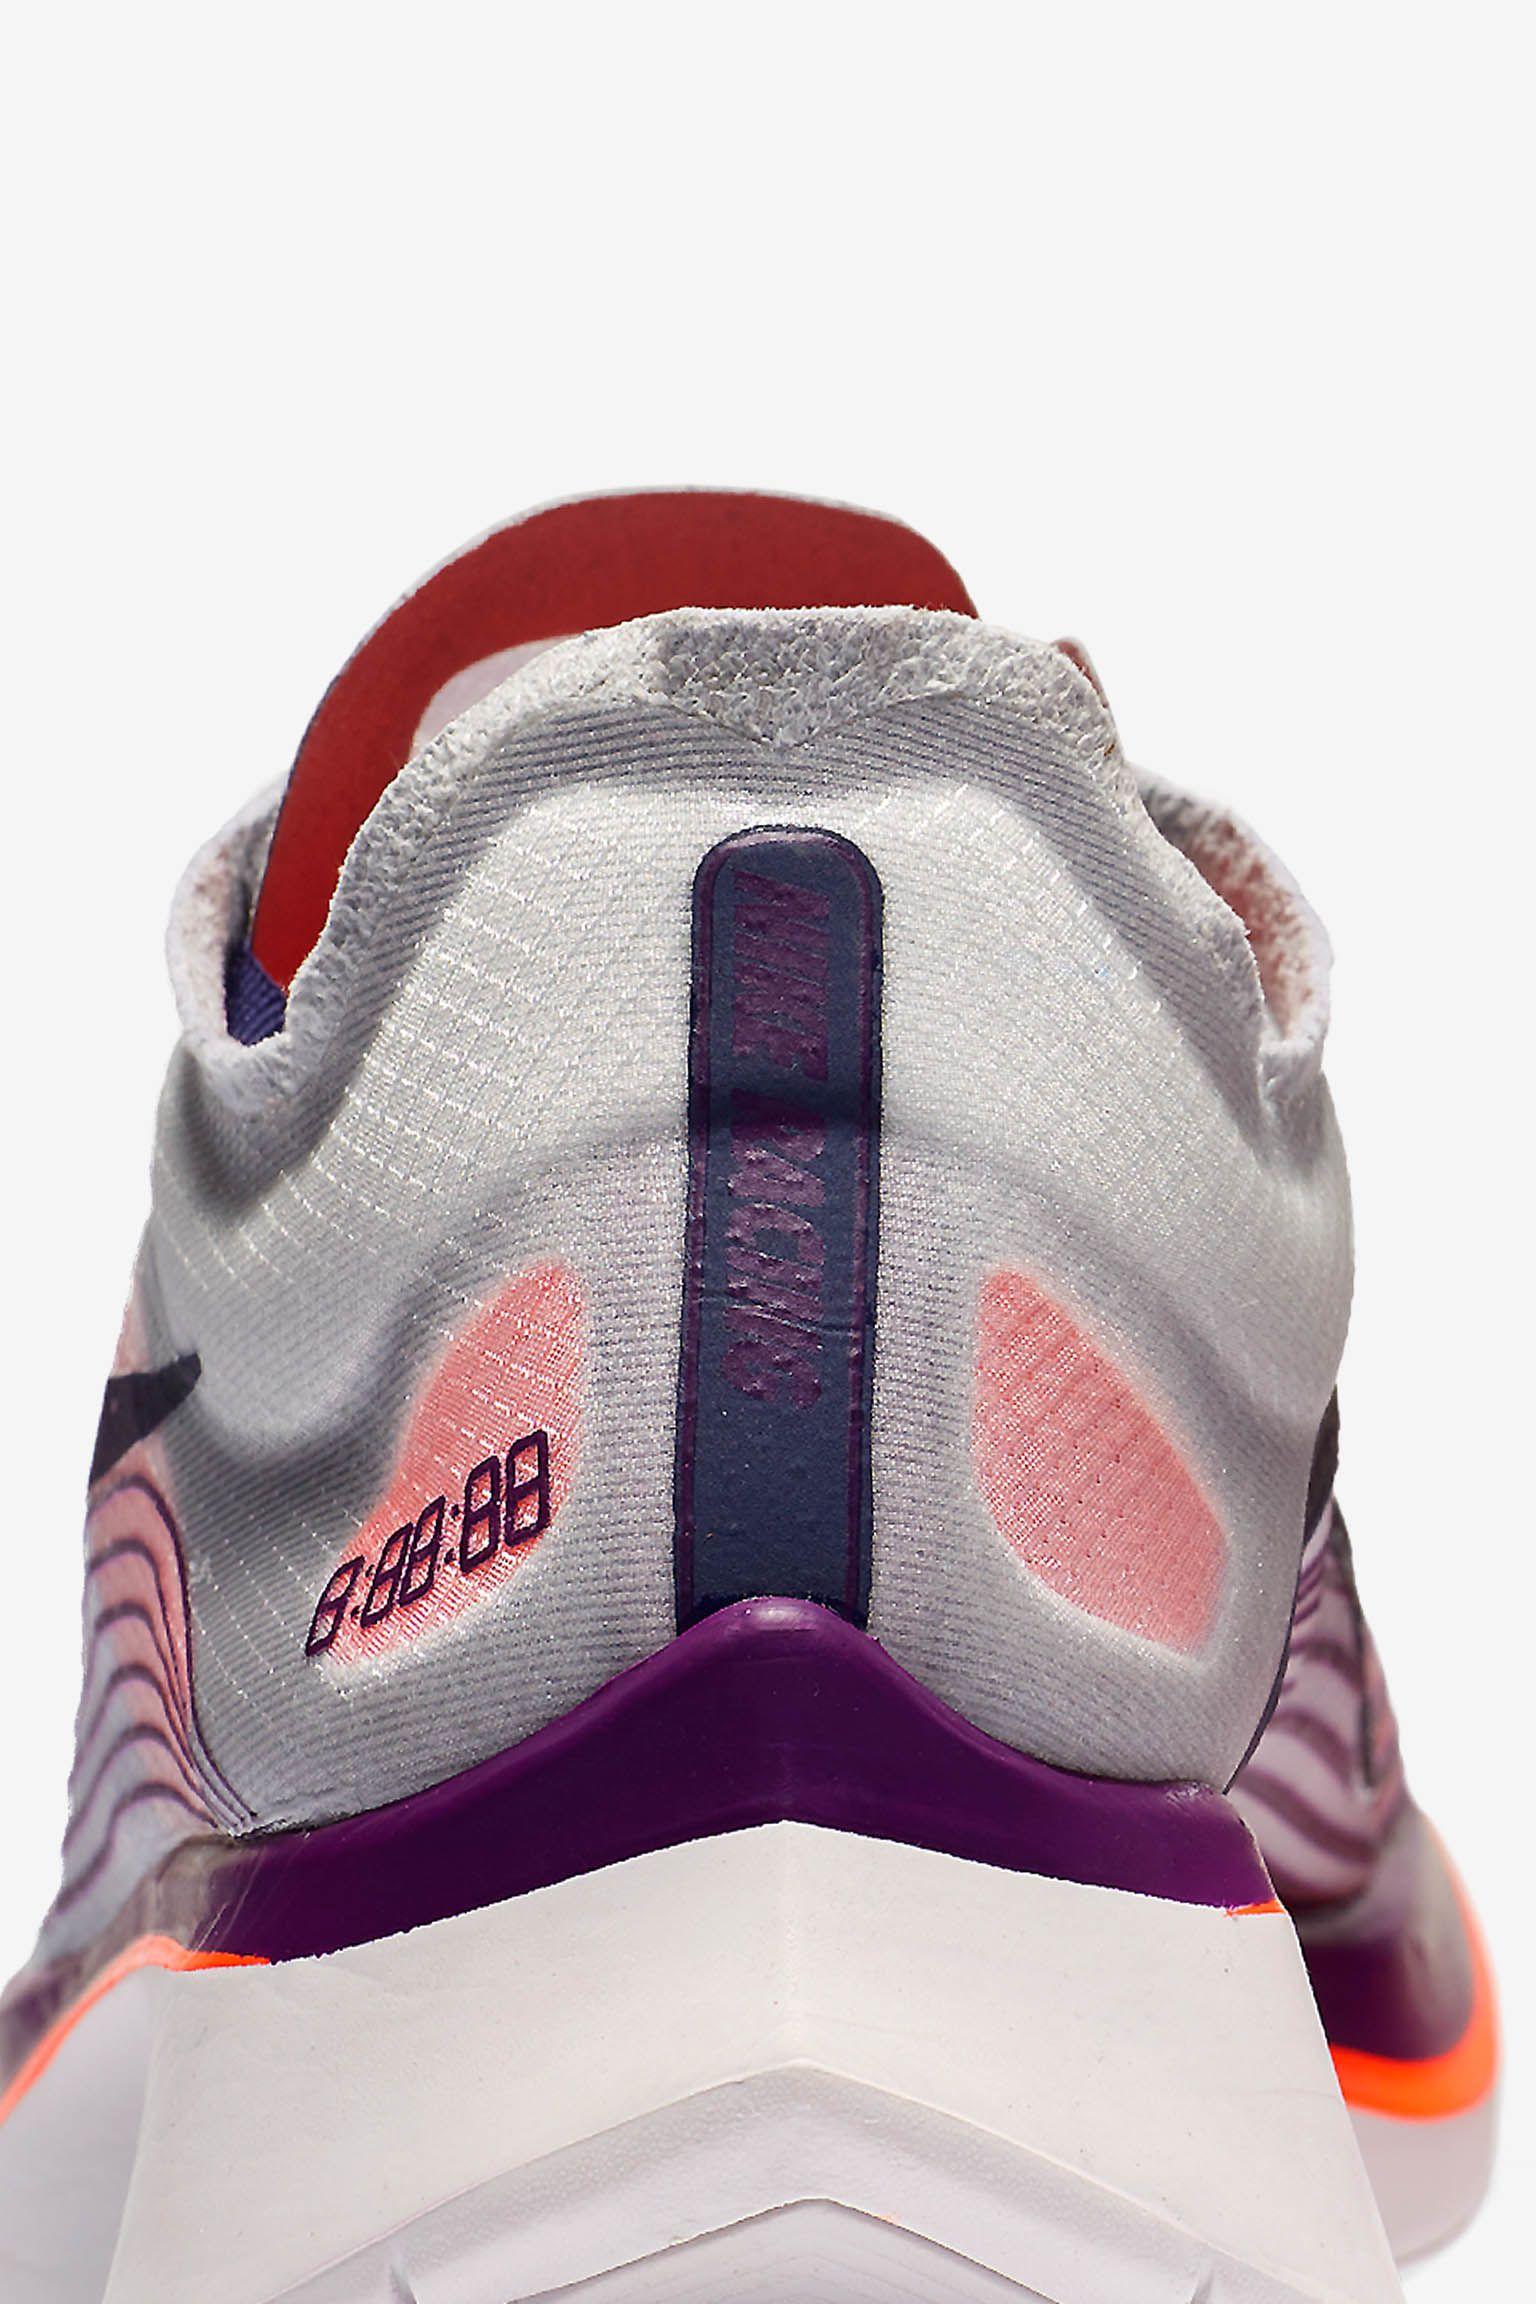 Nike Zoom Fly 'Neutral Indigo & Total Crimson' Release Date